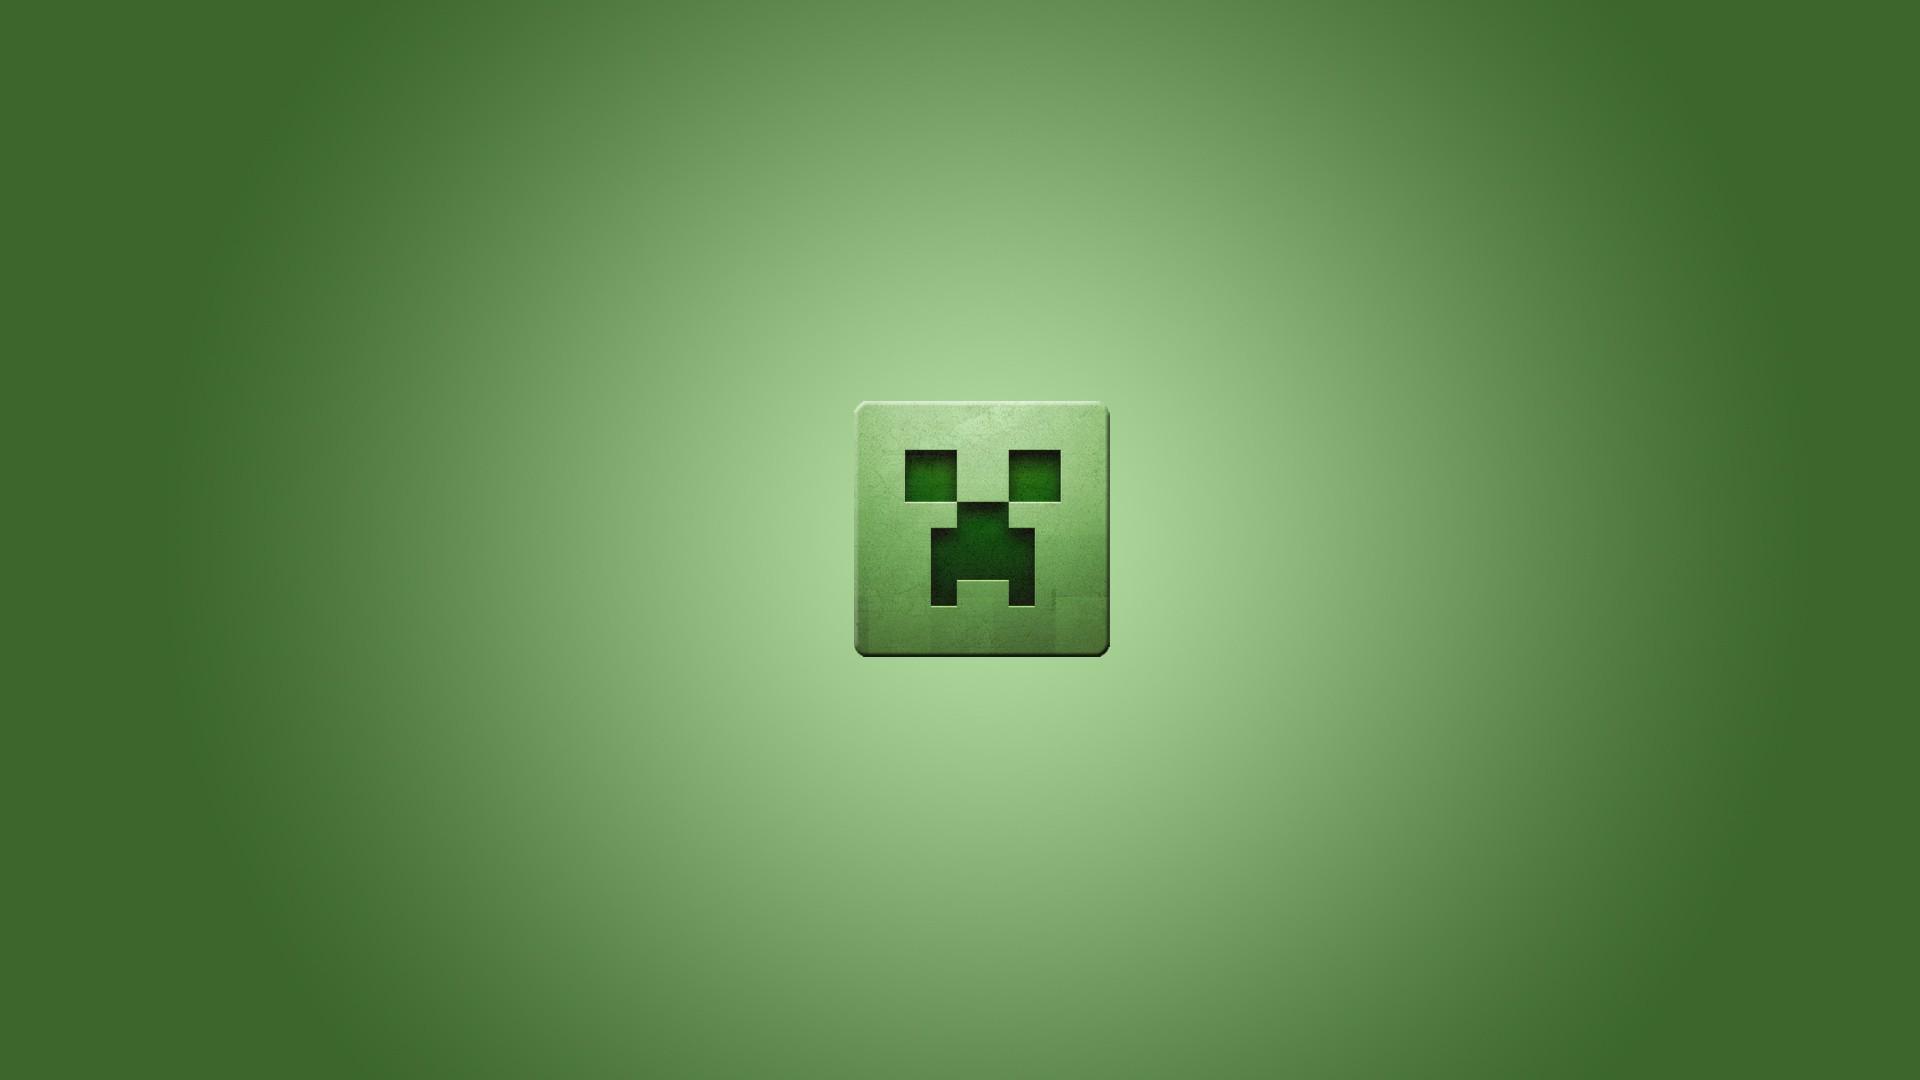 Video games minimalistic creeper Minecraft simplistic ...